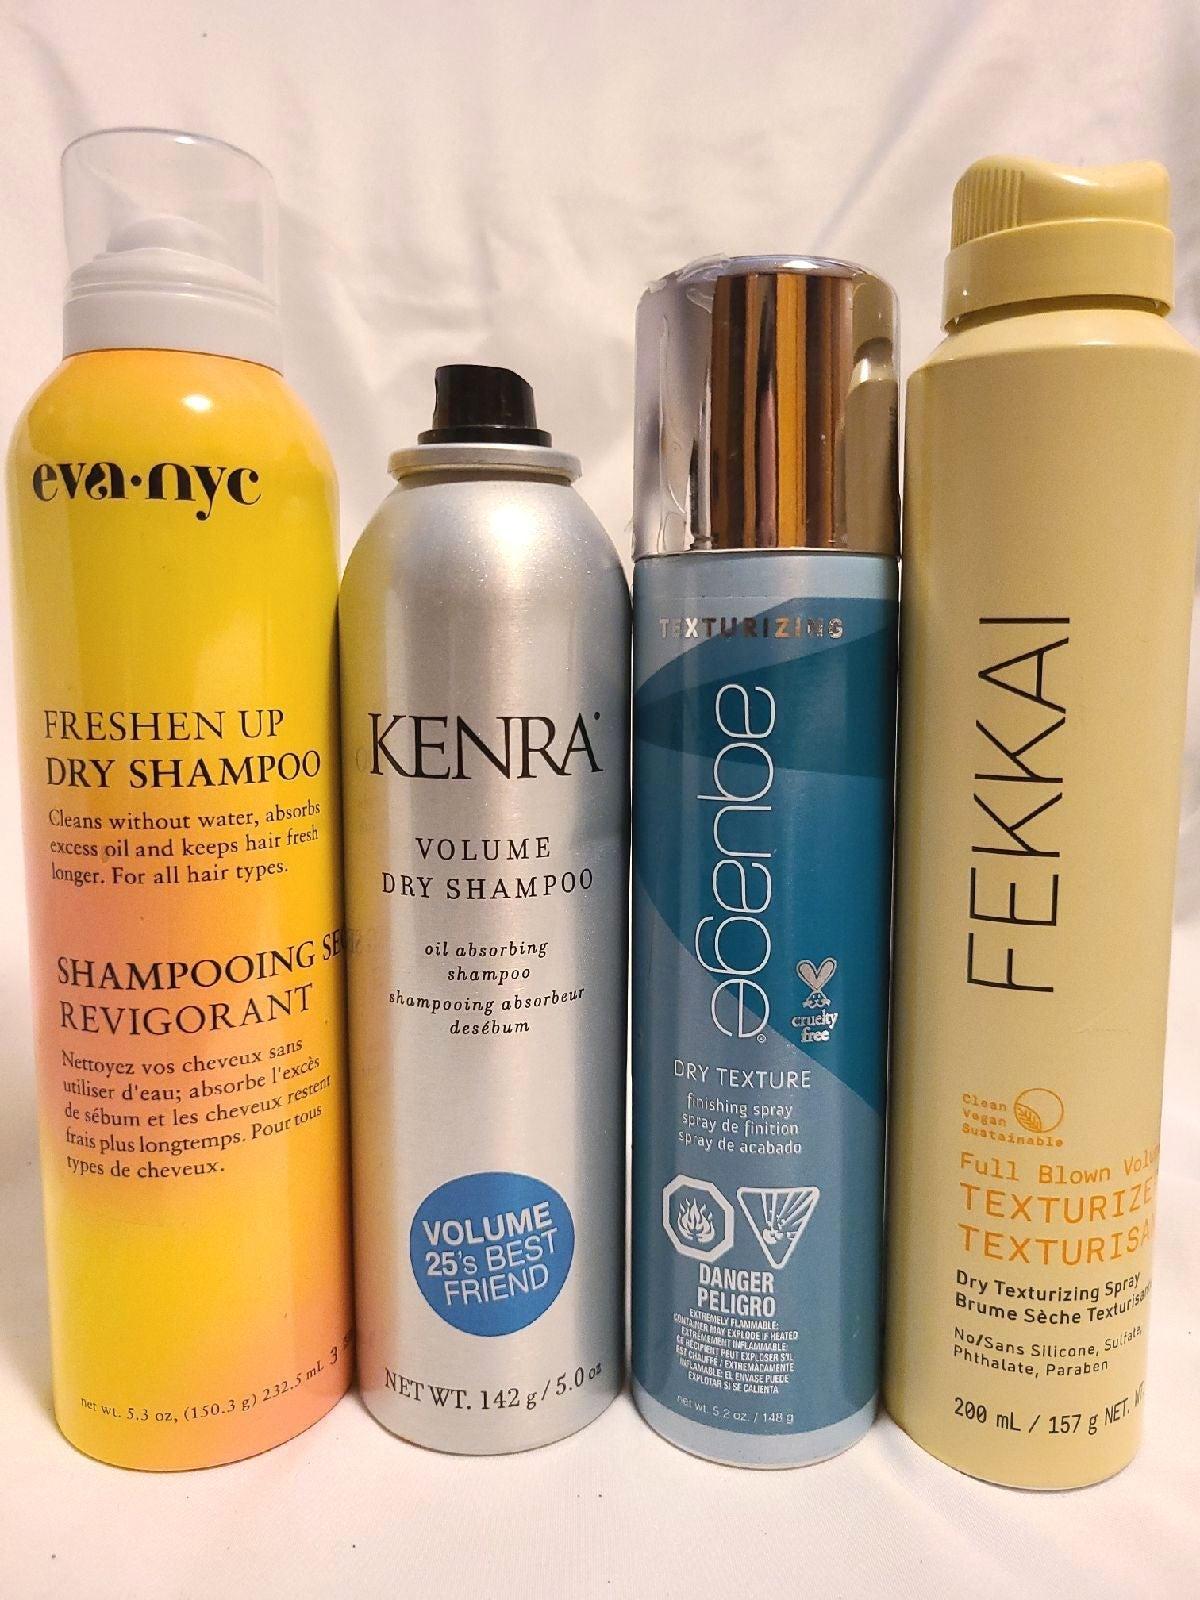 High end dry shampoo and texturizing spr